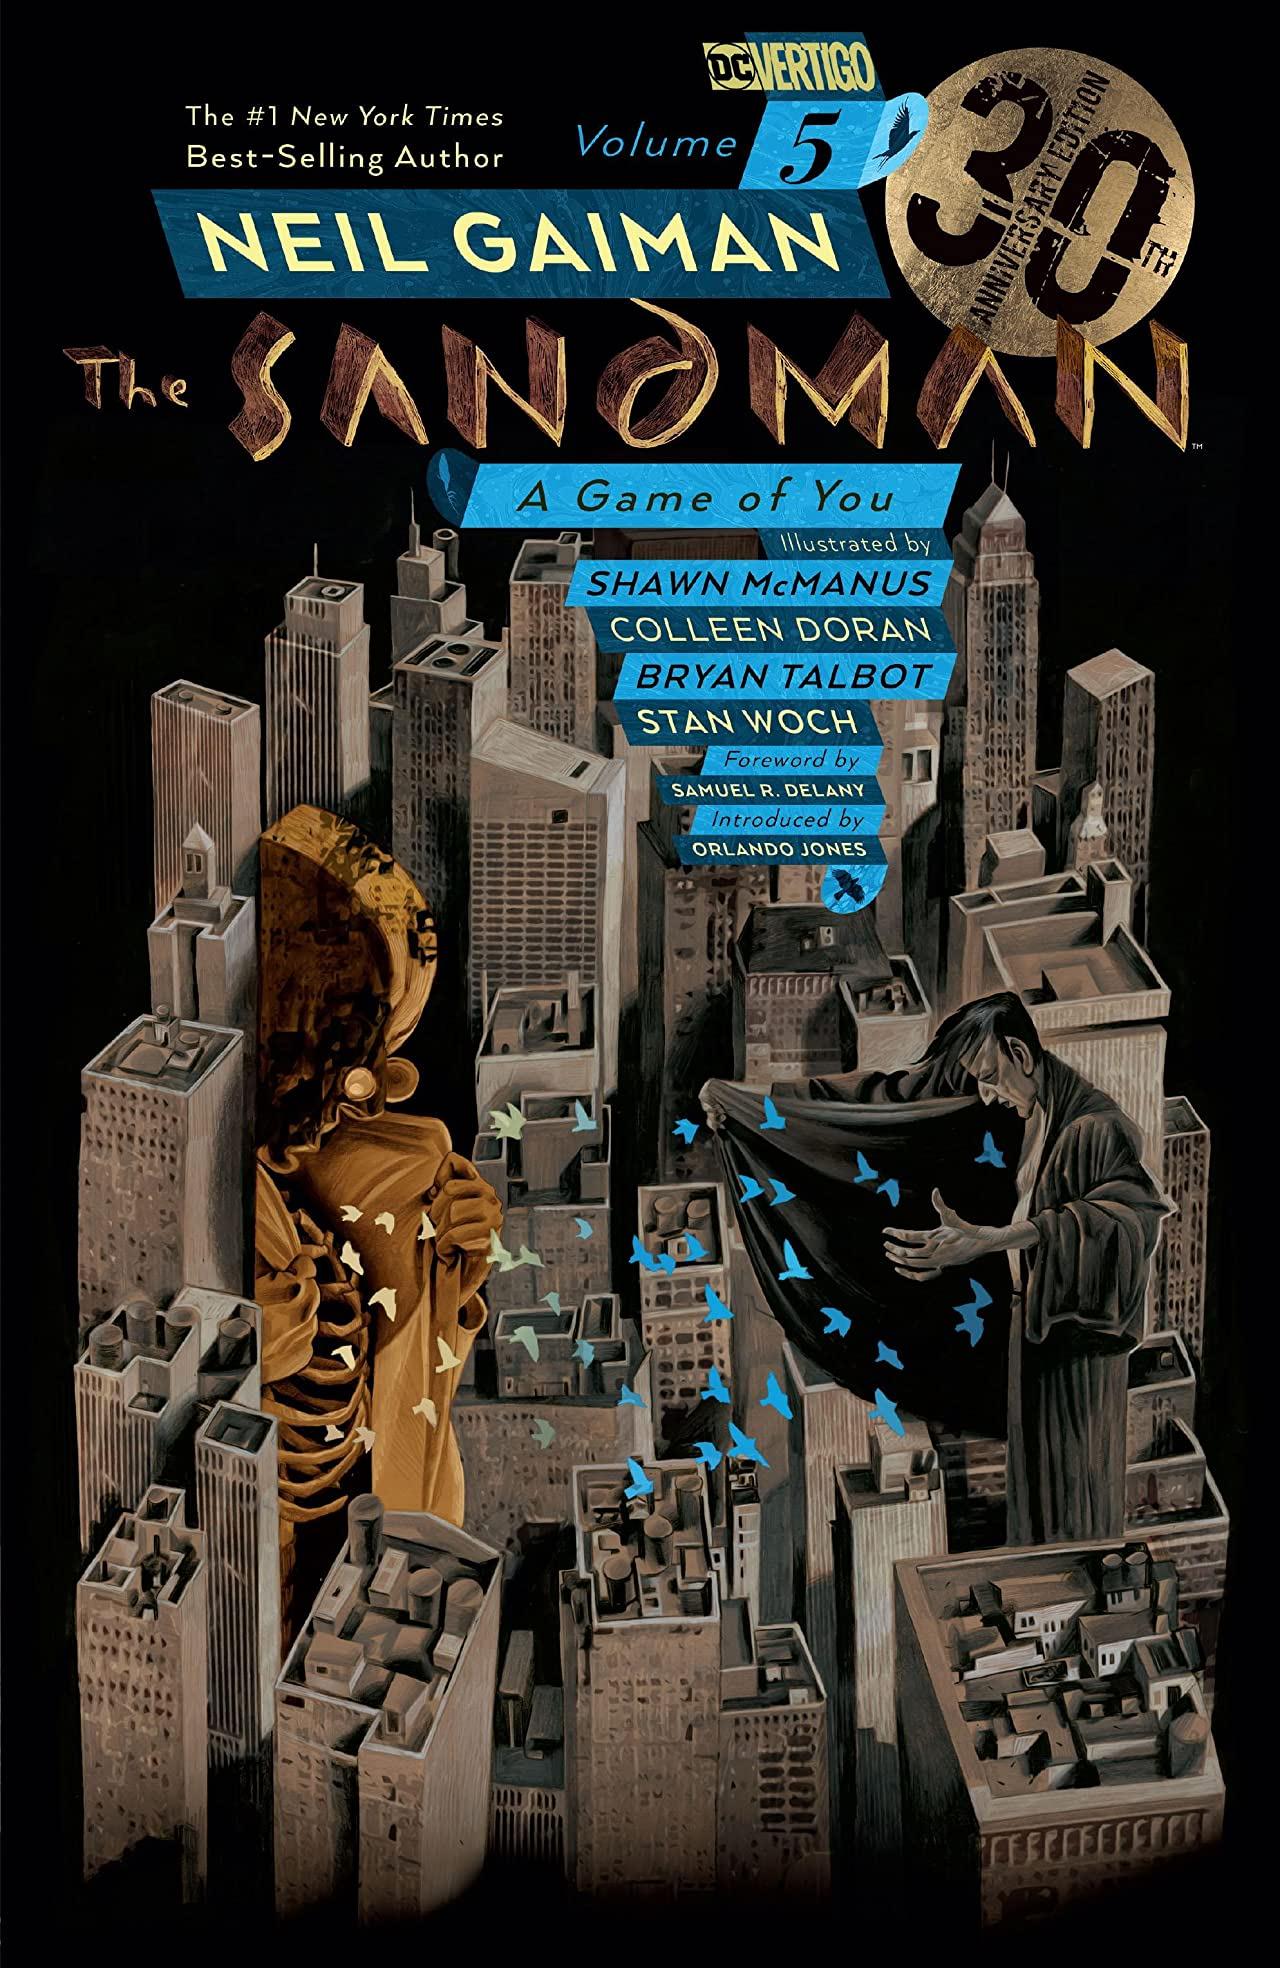 Sandman Vol. 5: A Game of You - 30th Anniversary Edition by Neil Gaiman